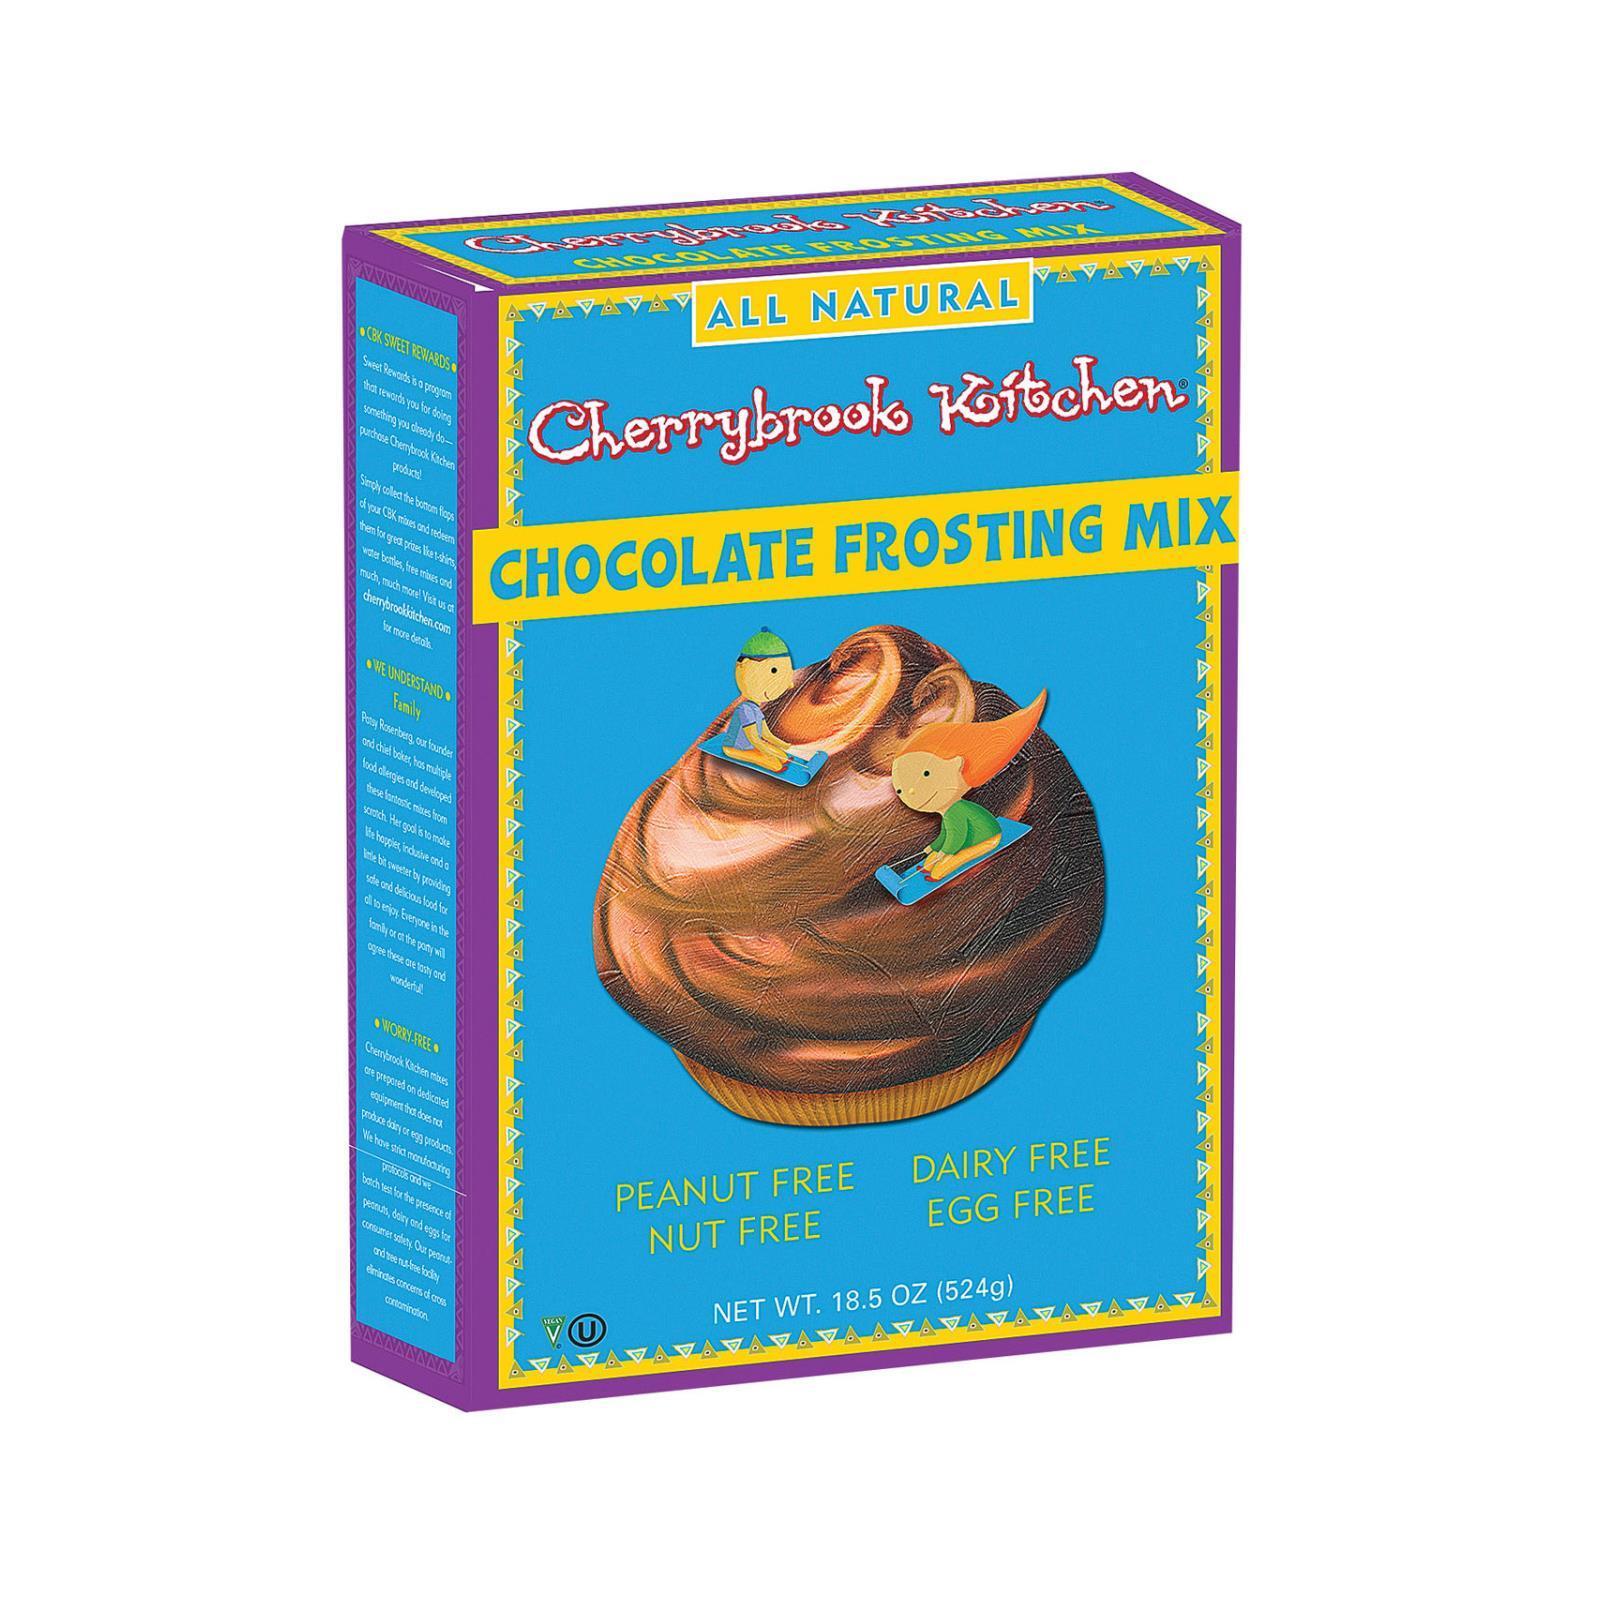 Cherrybrook Kitchen Chocolate Frosting Mix - Case of 6 - 10.5oz